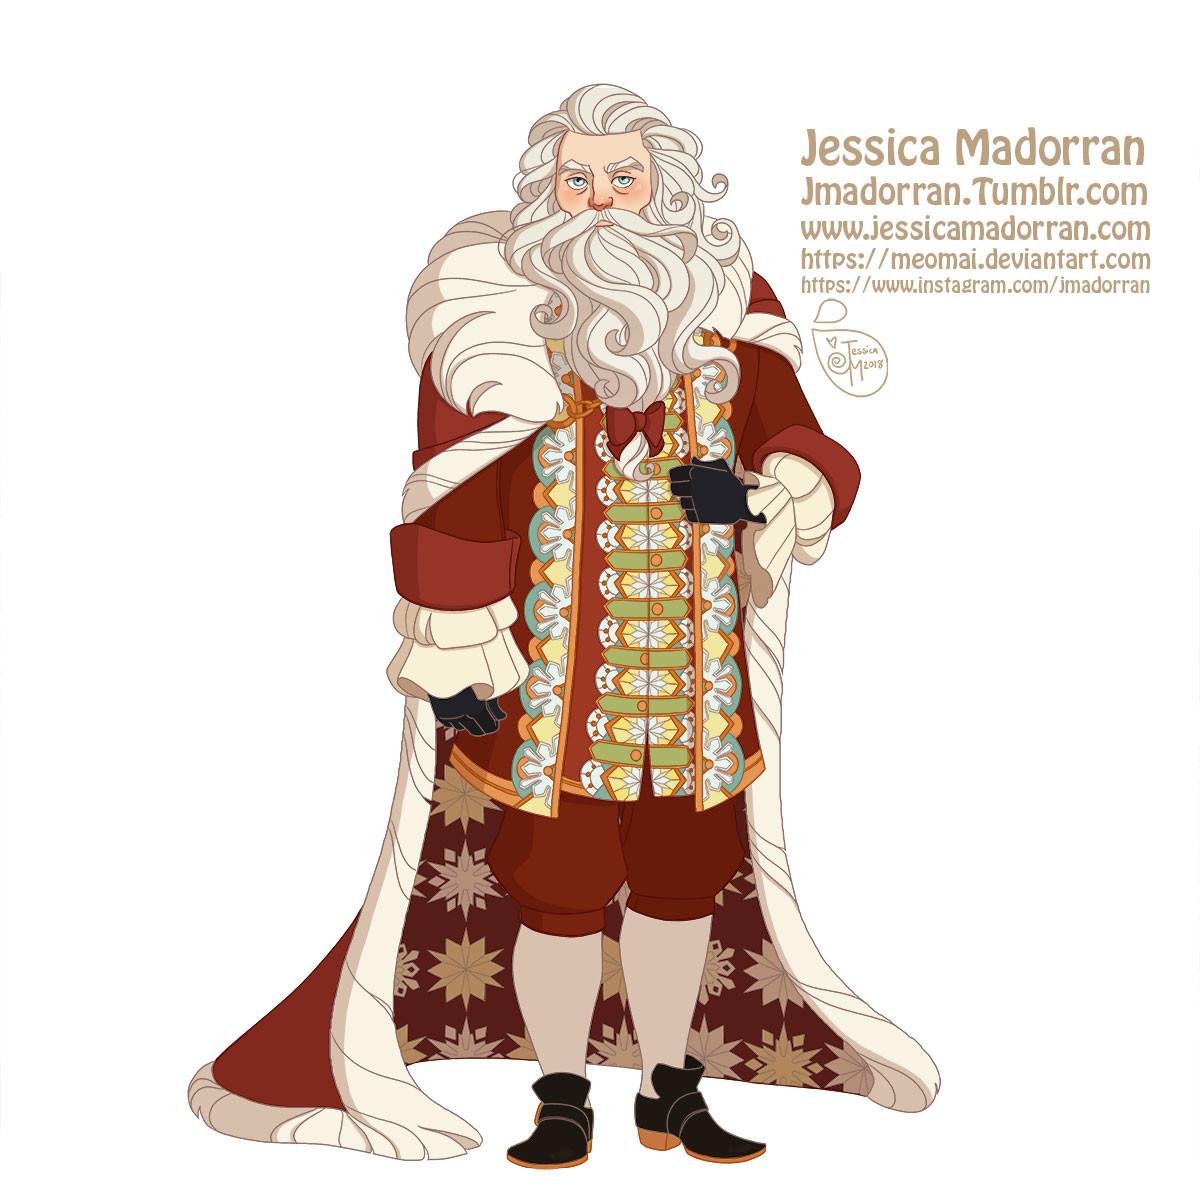 Jessica madorran character design paris 2018 versailles santa family individuals santa